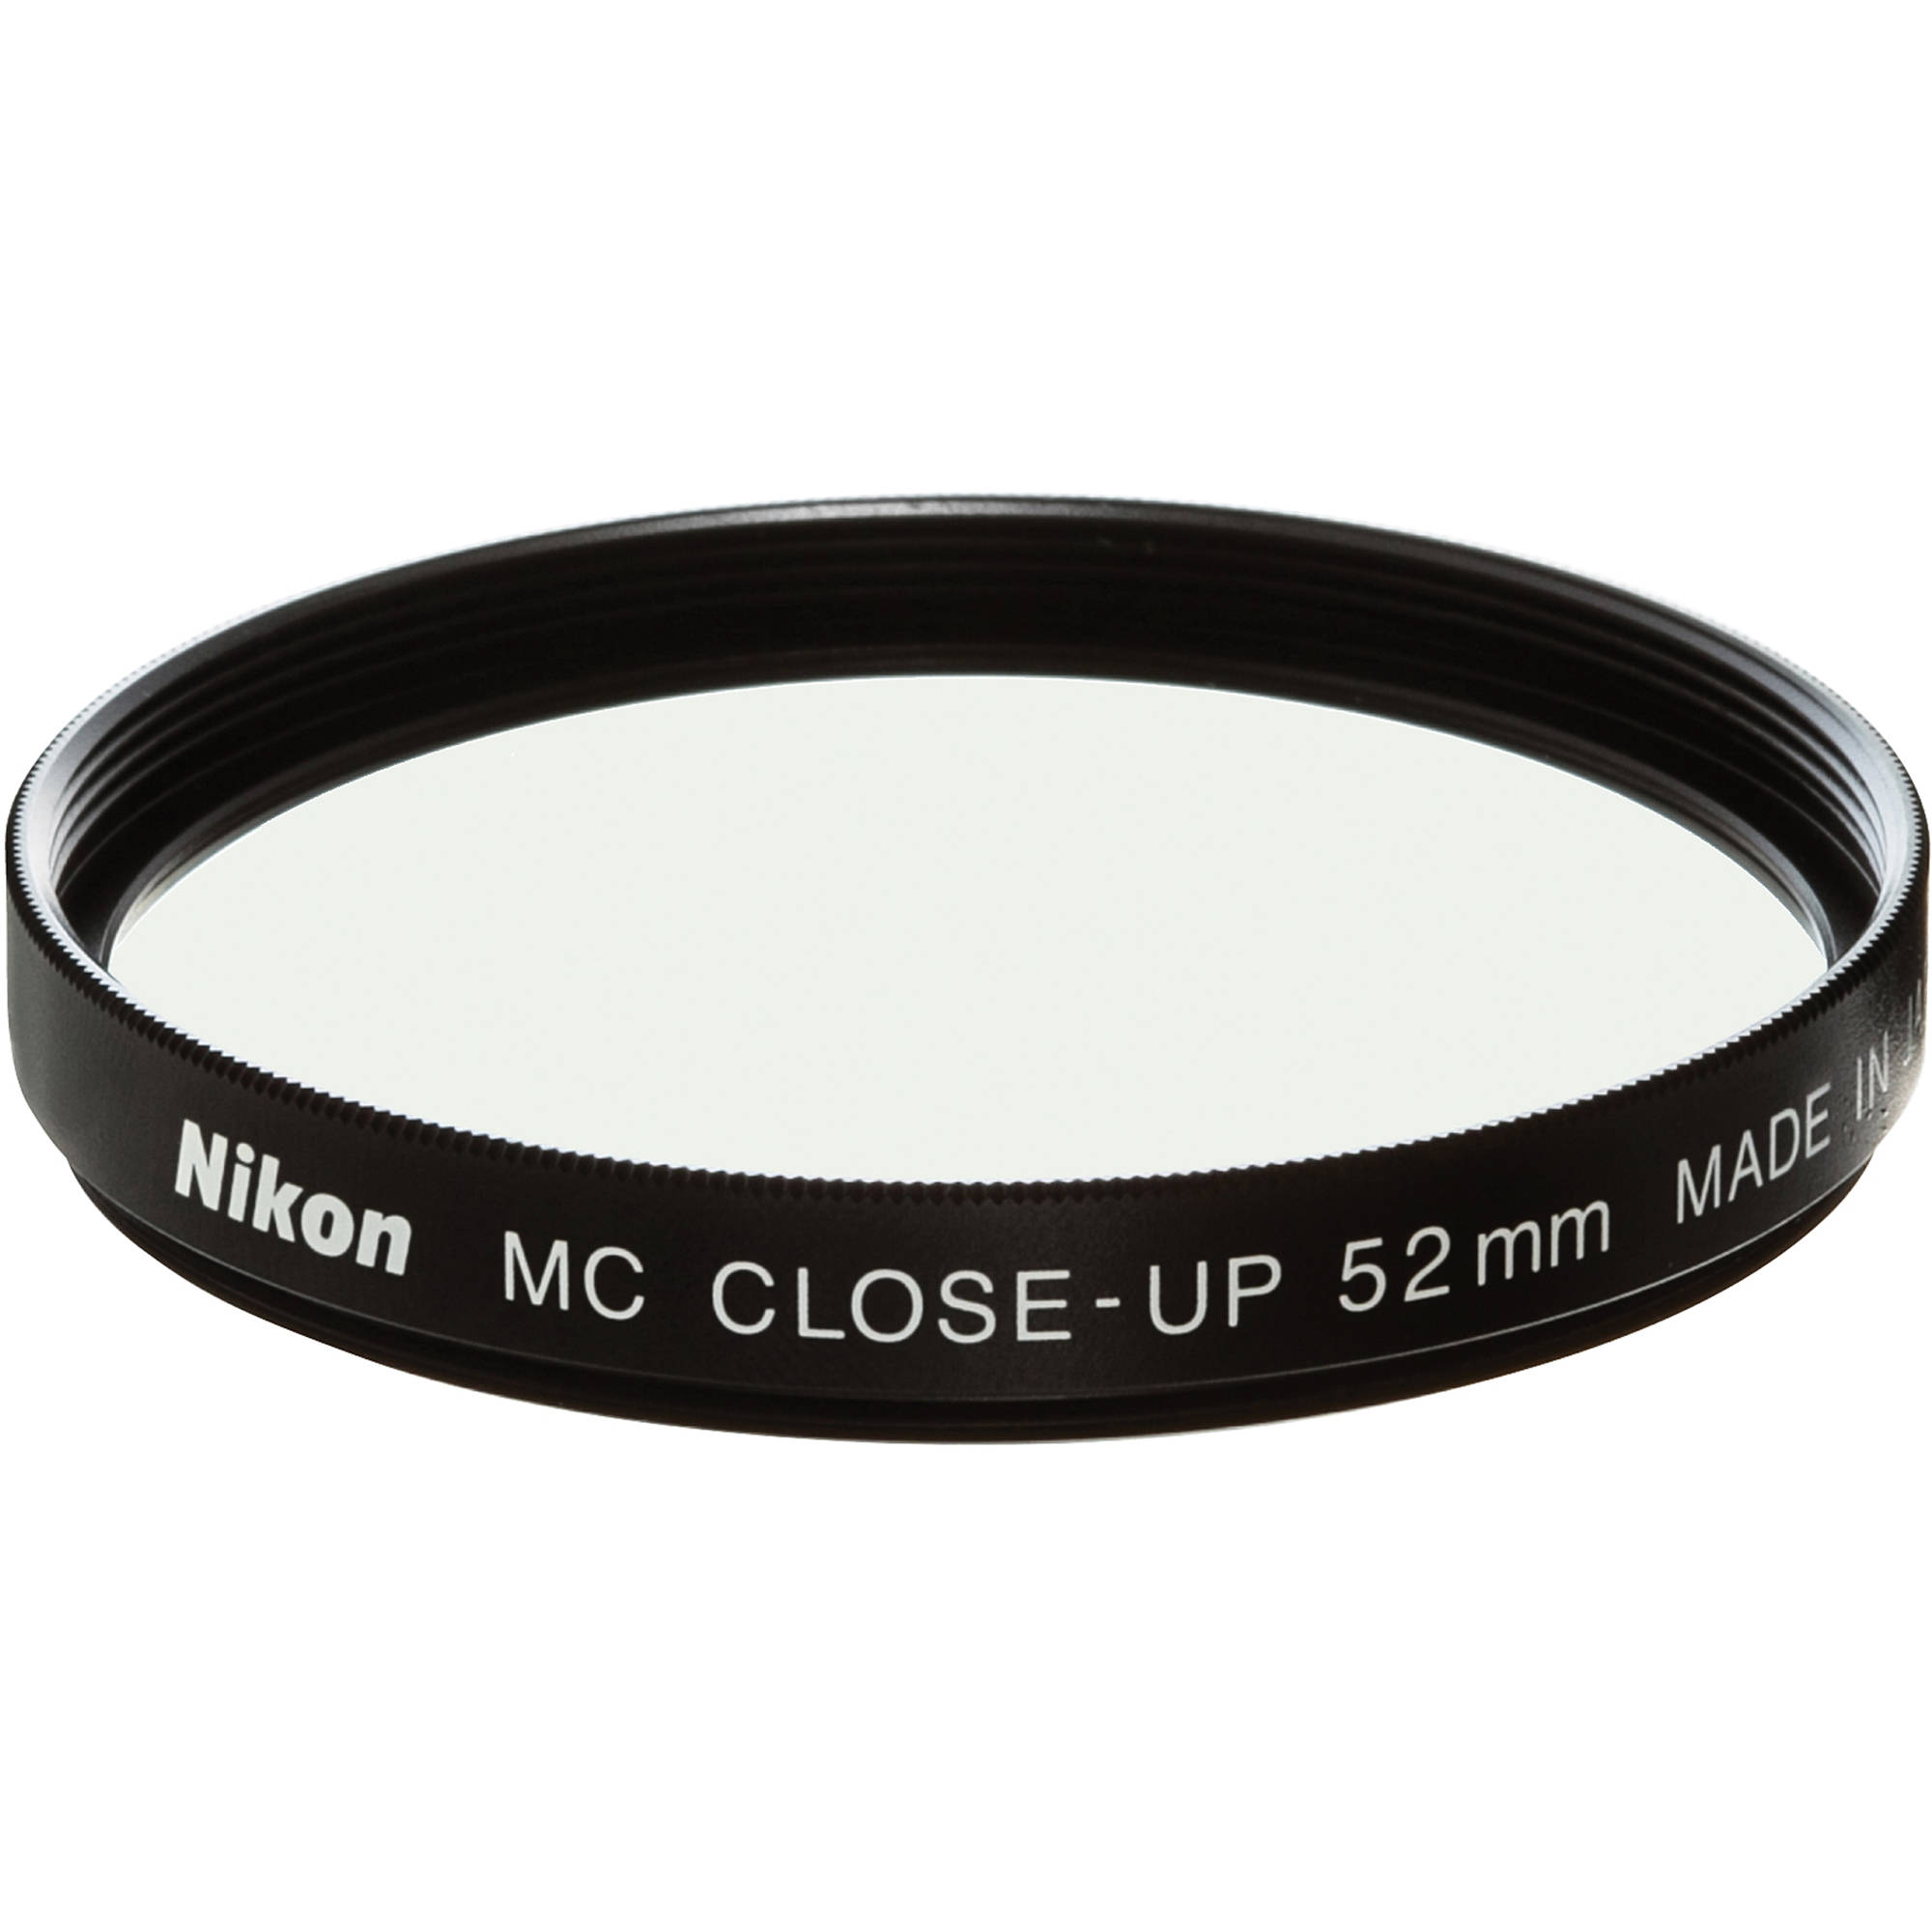 52mm lens closeup photo